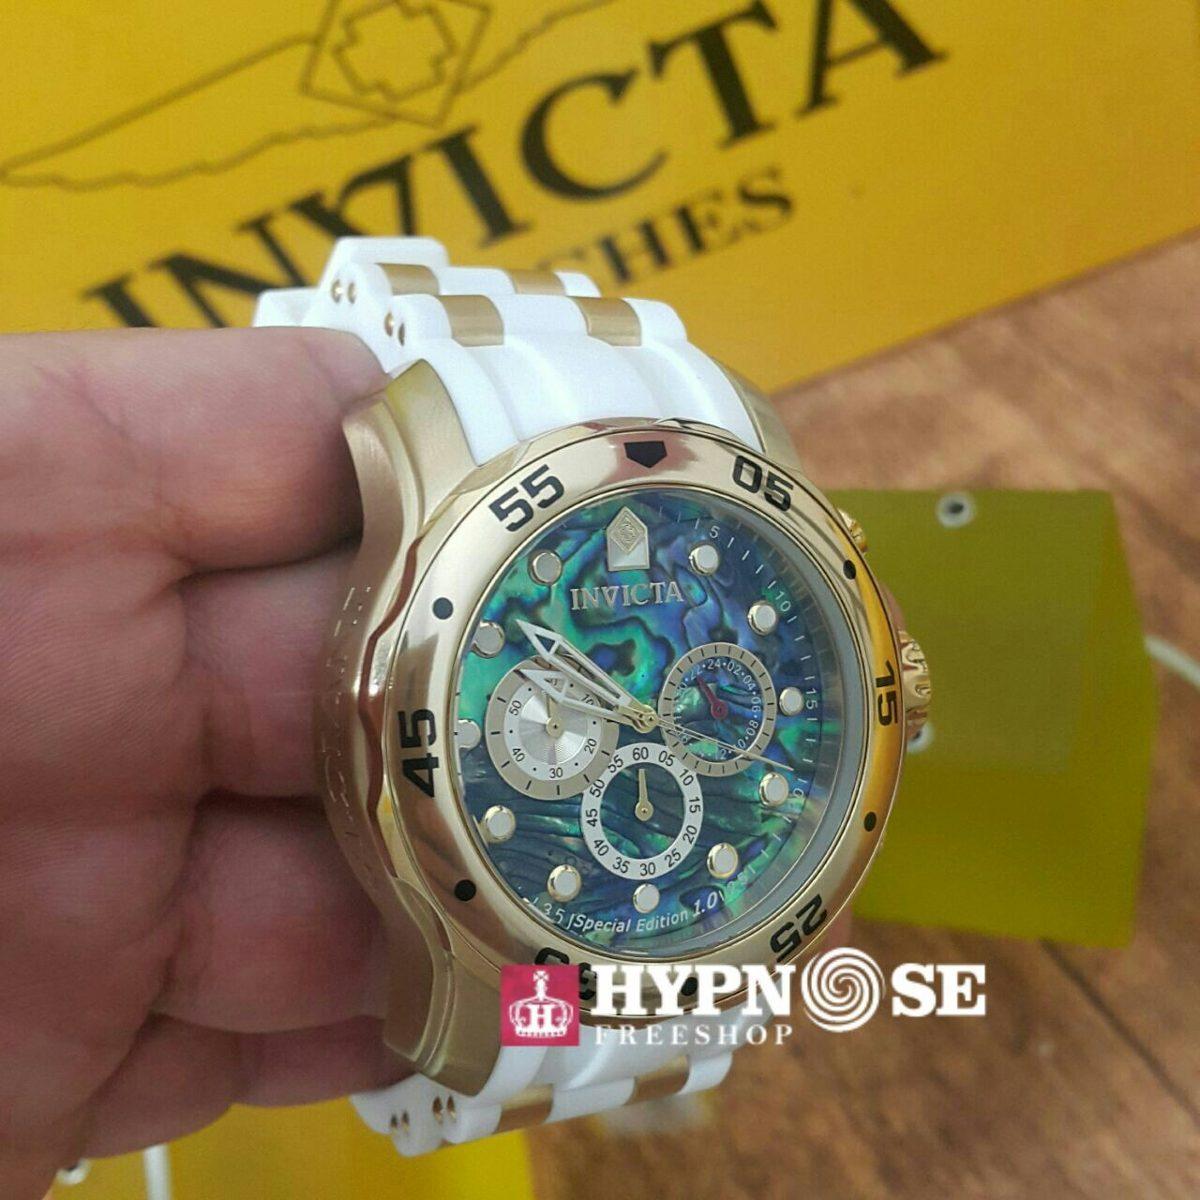 00857cfba91 relógio invicta 24840 pulseira de borracha + maleta slot 1. Carregando zoom.